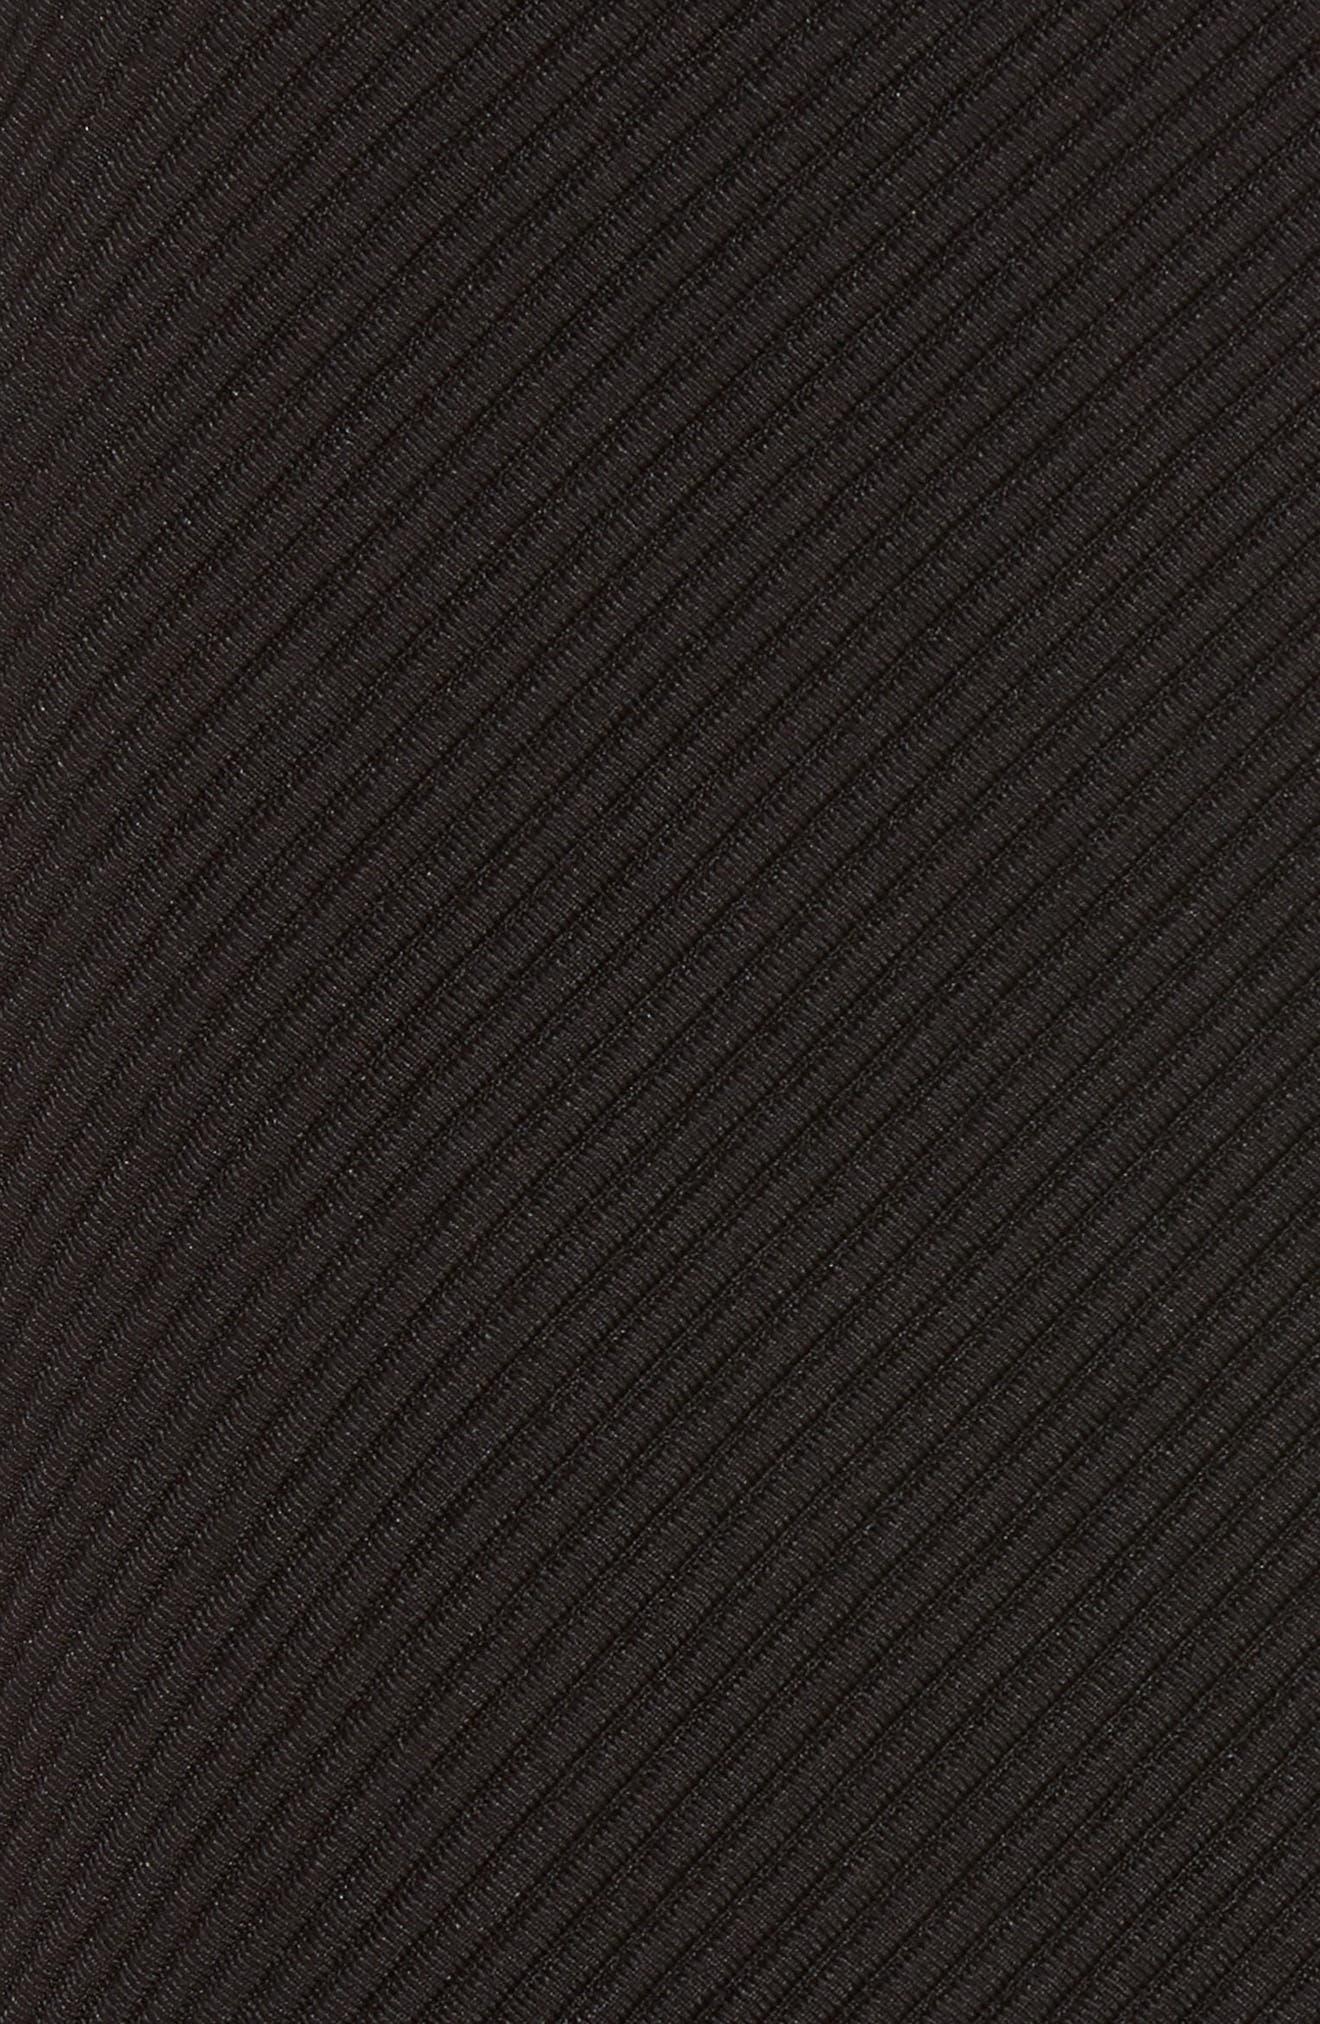 A-Line Knit Miniskirt,                             Alternate thumbnail 5, color,                             001